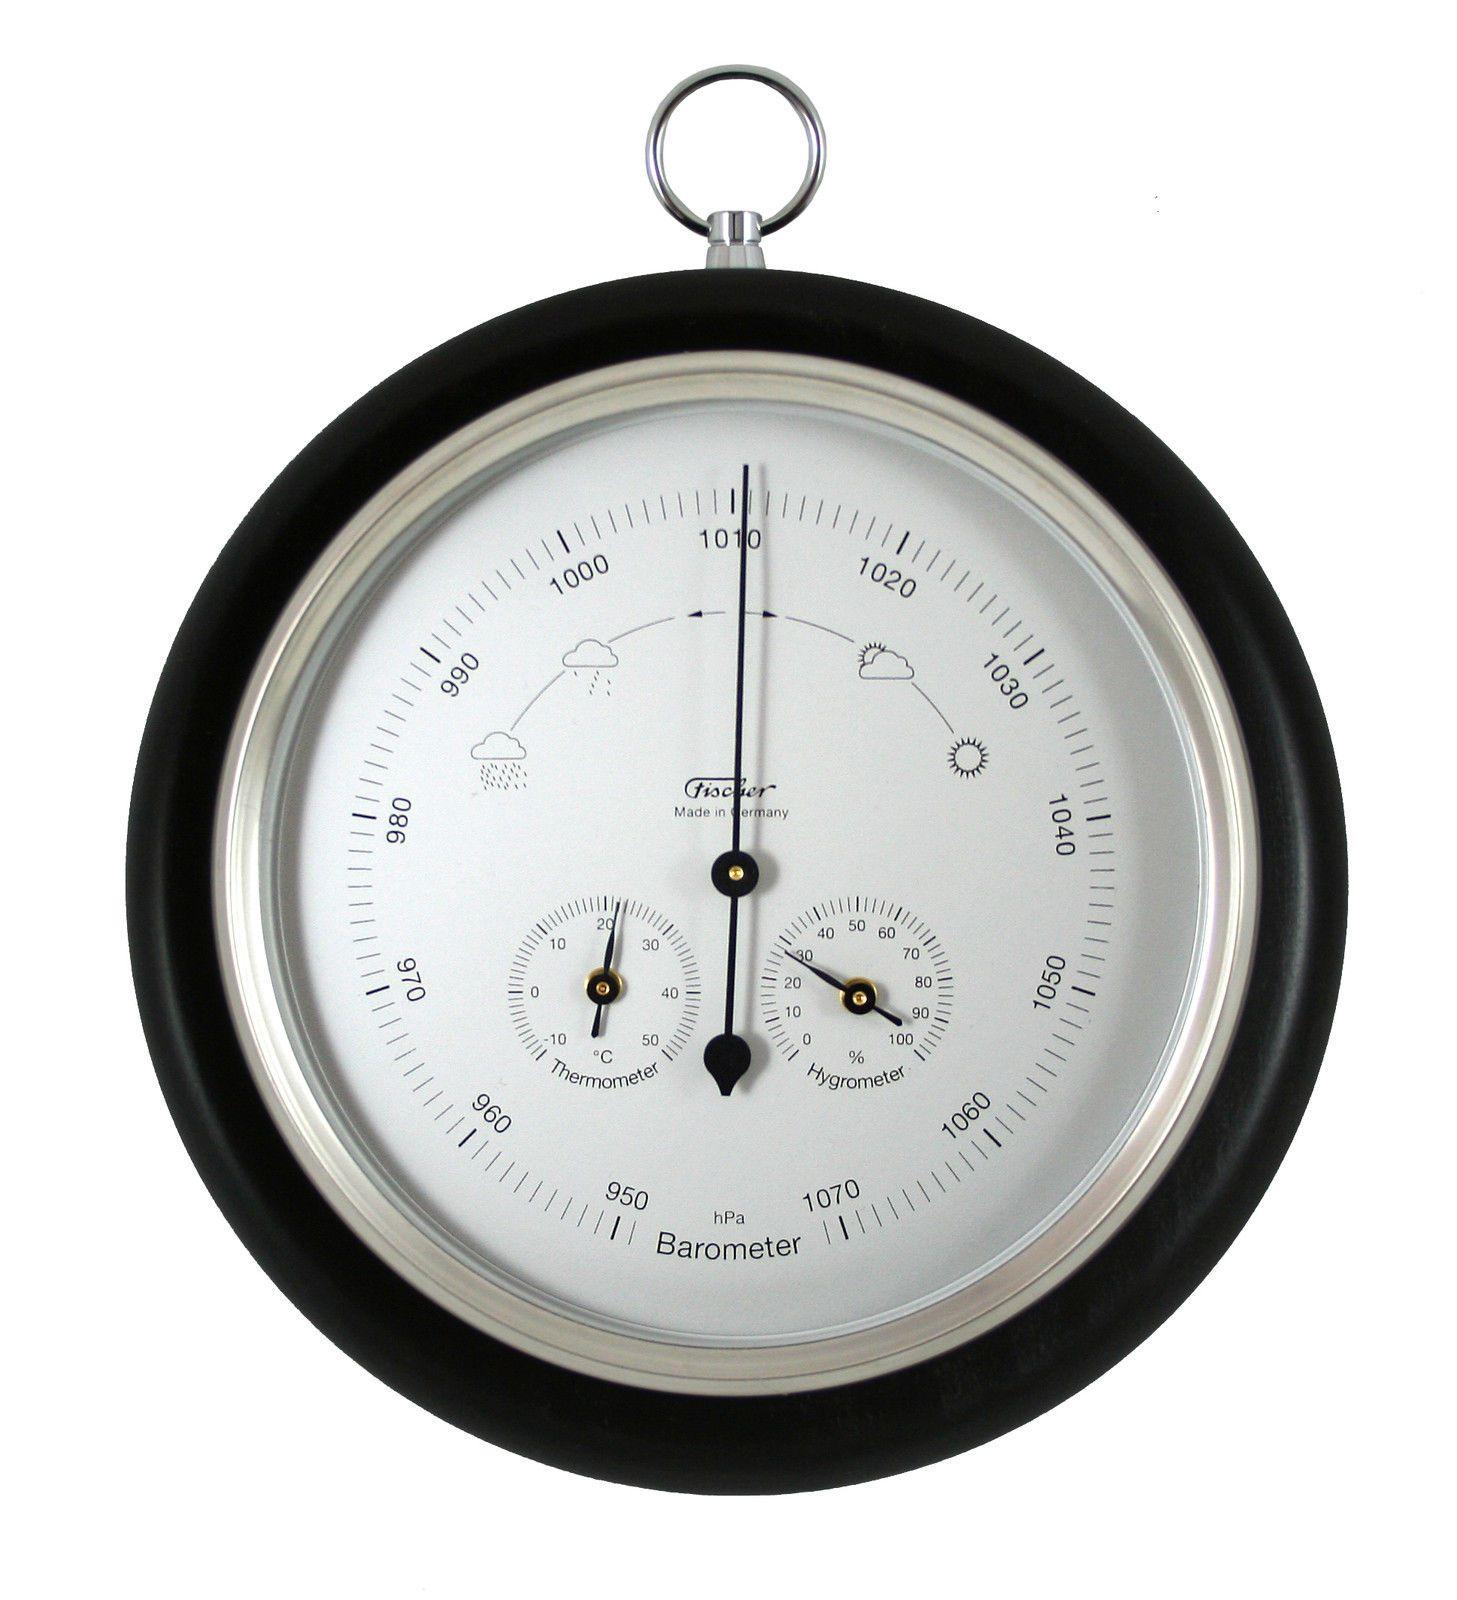 Fishing Barometer Thermometer Hygrometer Silver Black 1694rs 06 Uk Ebay Barometer Hygrometer Thermometer